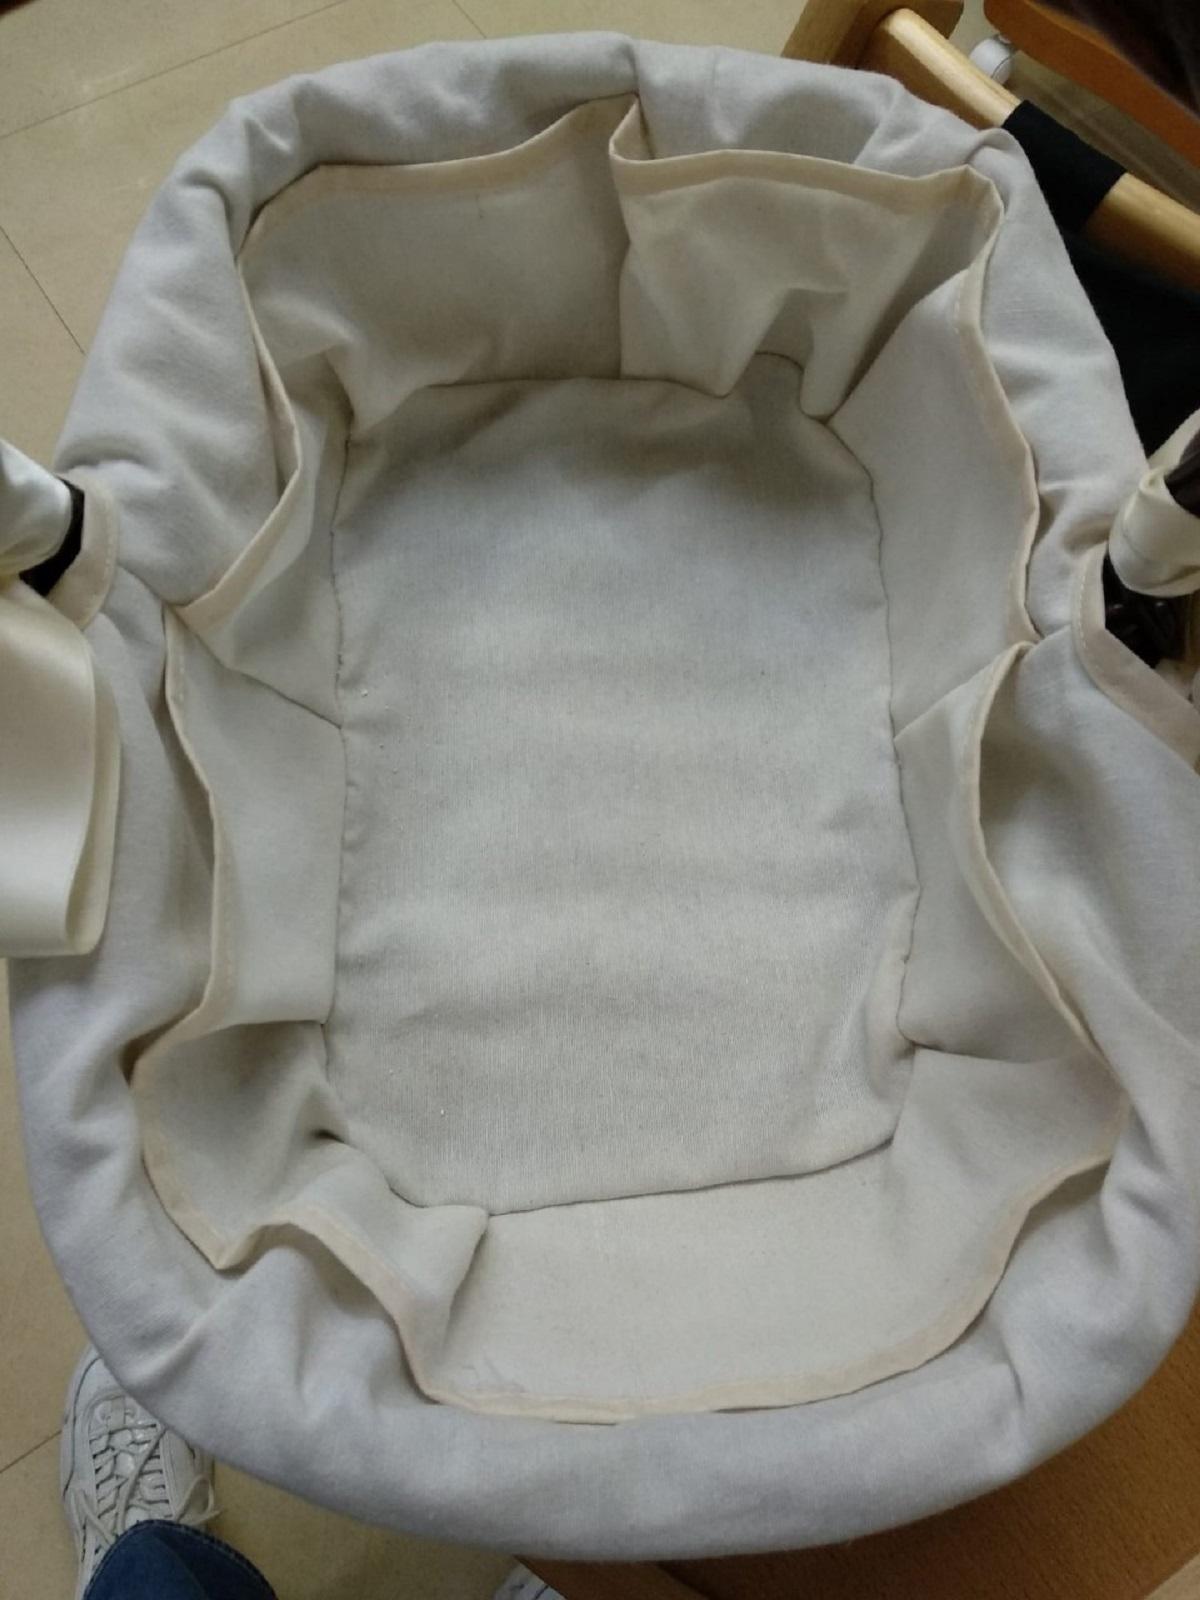 Canastilla Ovalada de mimbre en color nogal